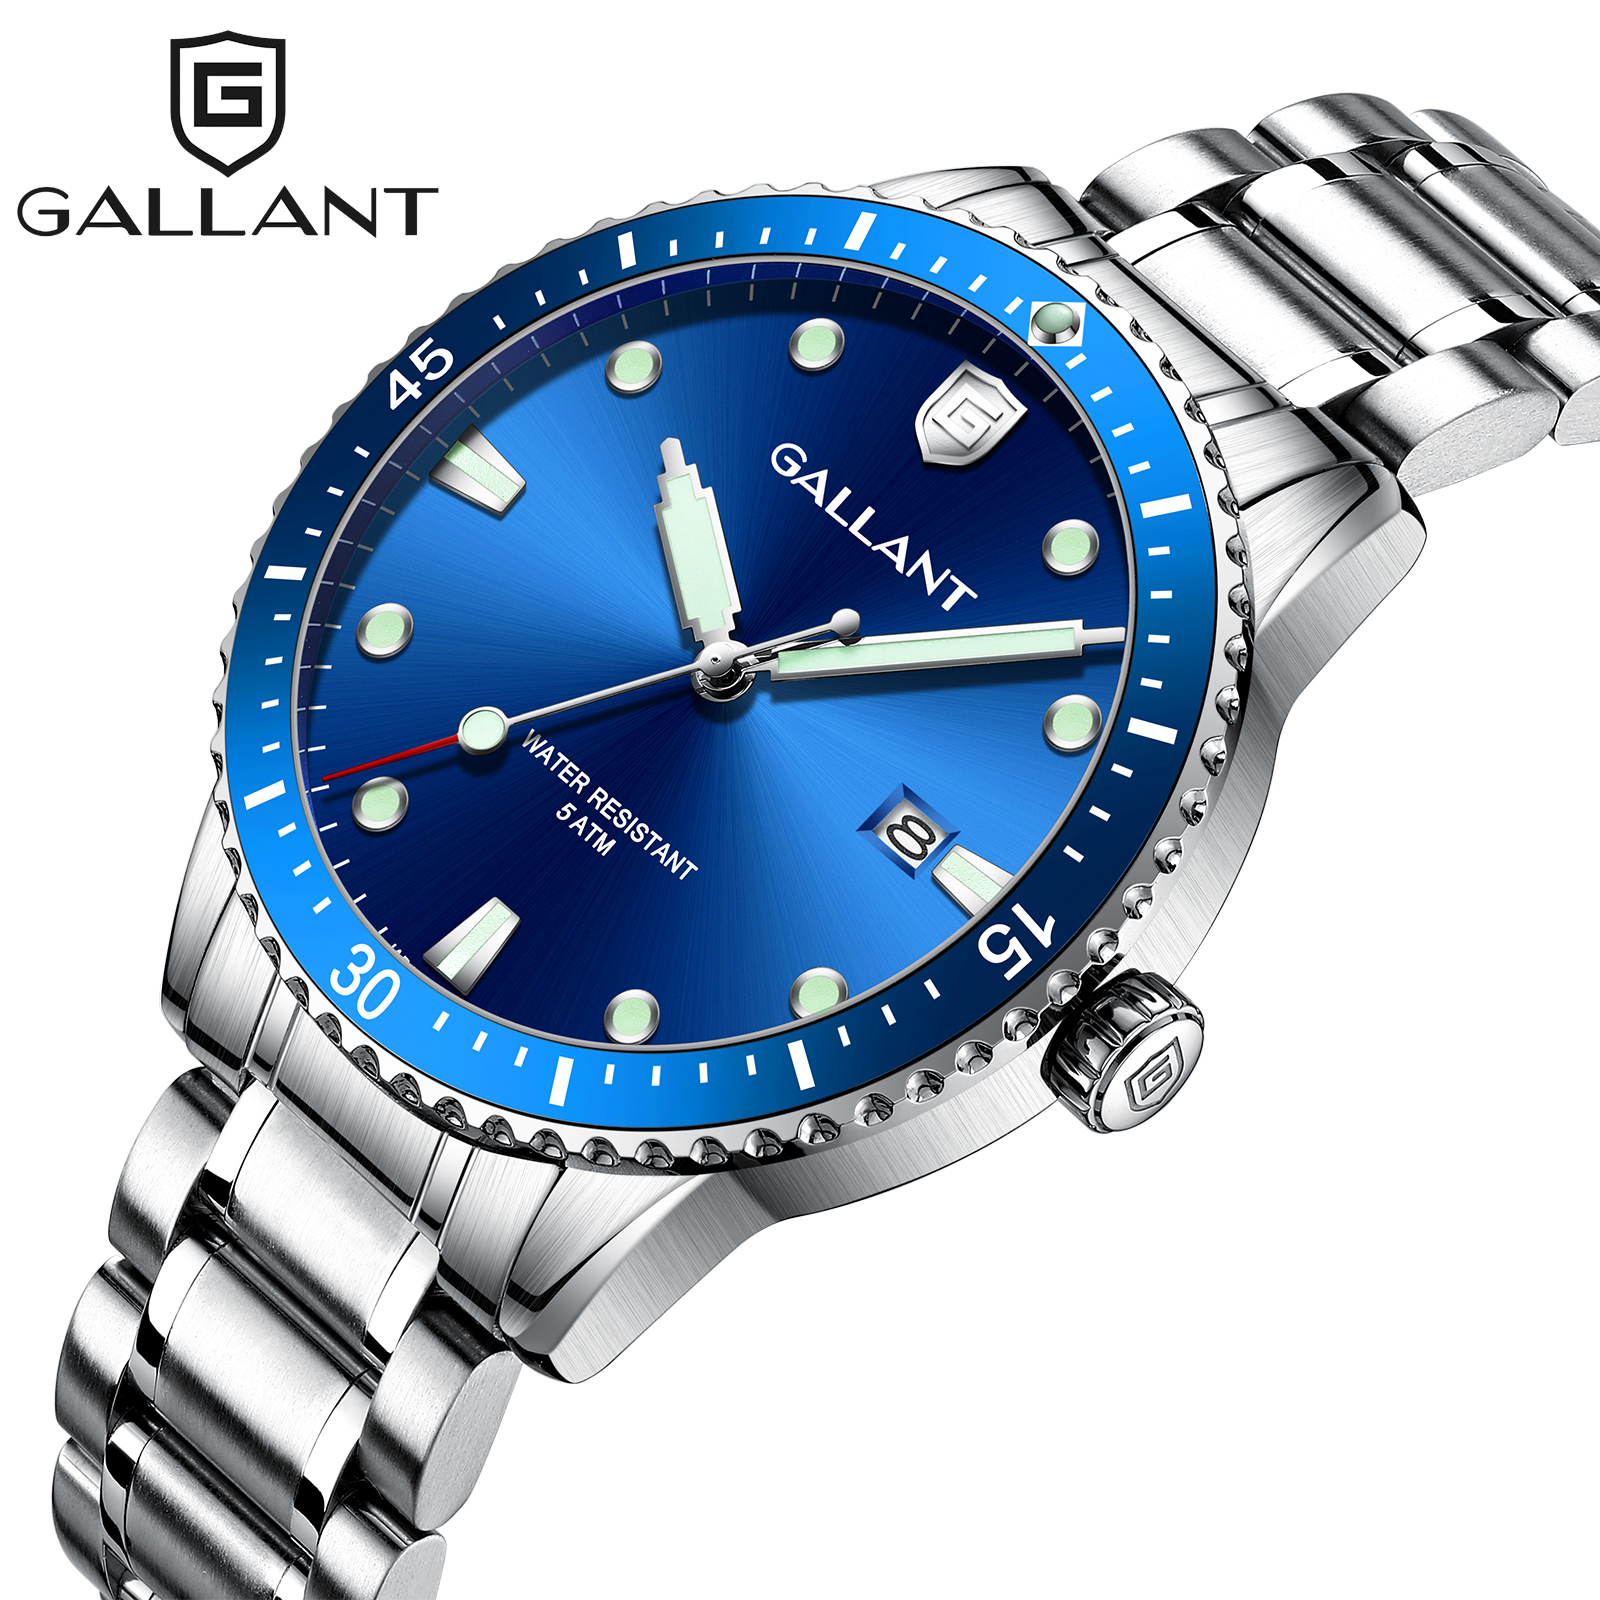 Blue Quartz Watch Watch Men Waterproof Watch Watches For Men